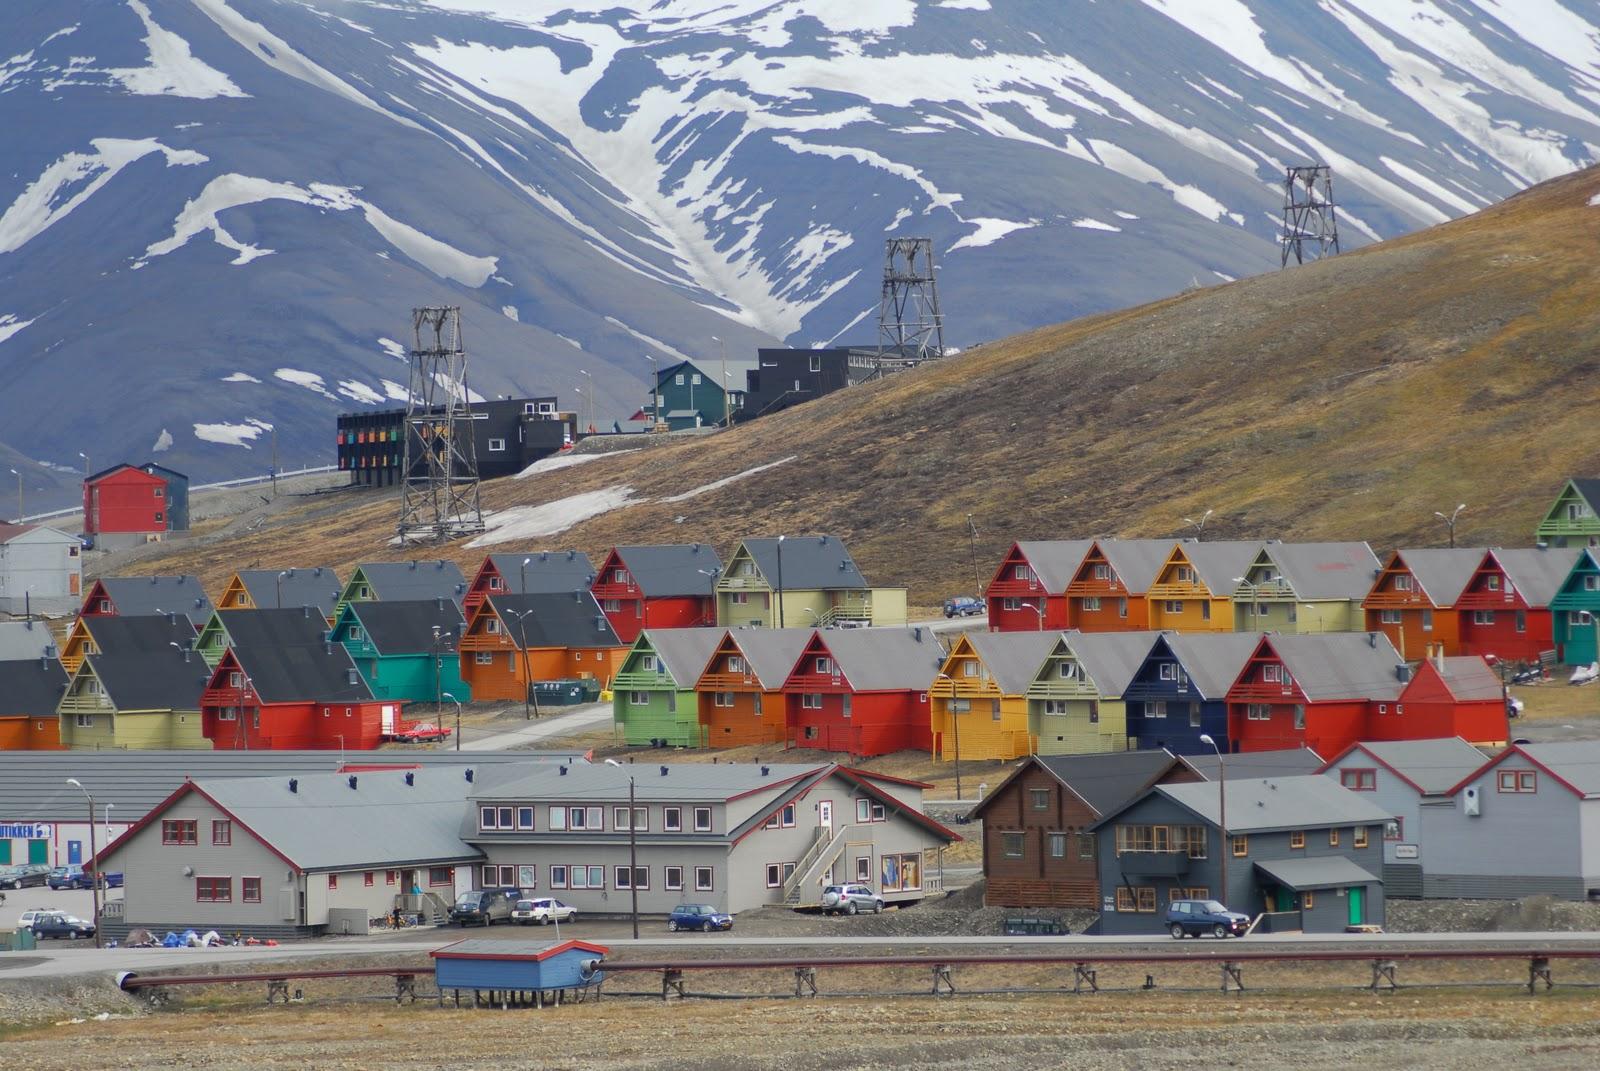 Image result for Svalbard (http://4.bp.blogspot.com/-oT6i8IlvGlA/TVsY-h6jpqI/AAAAAAAAABg/3dTteDm3di8/s1600/Longyearbyen_colourful_homes.jpg)